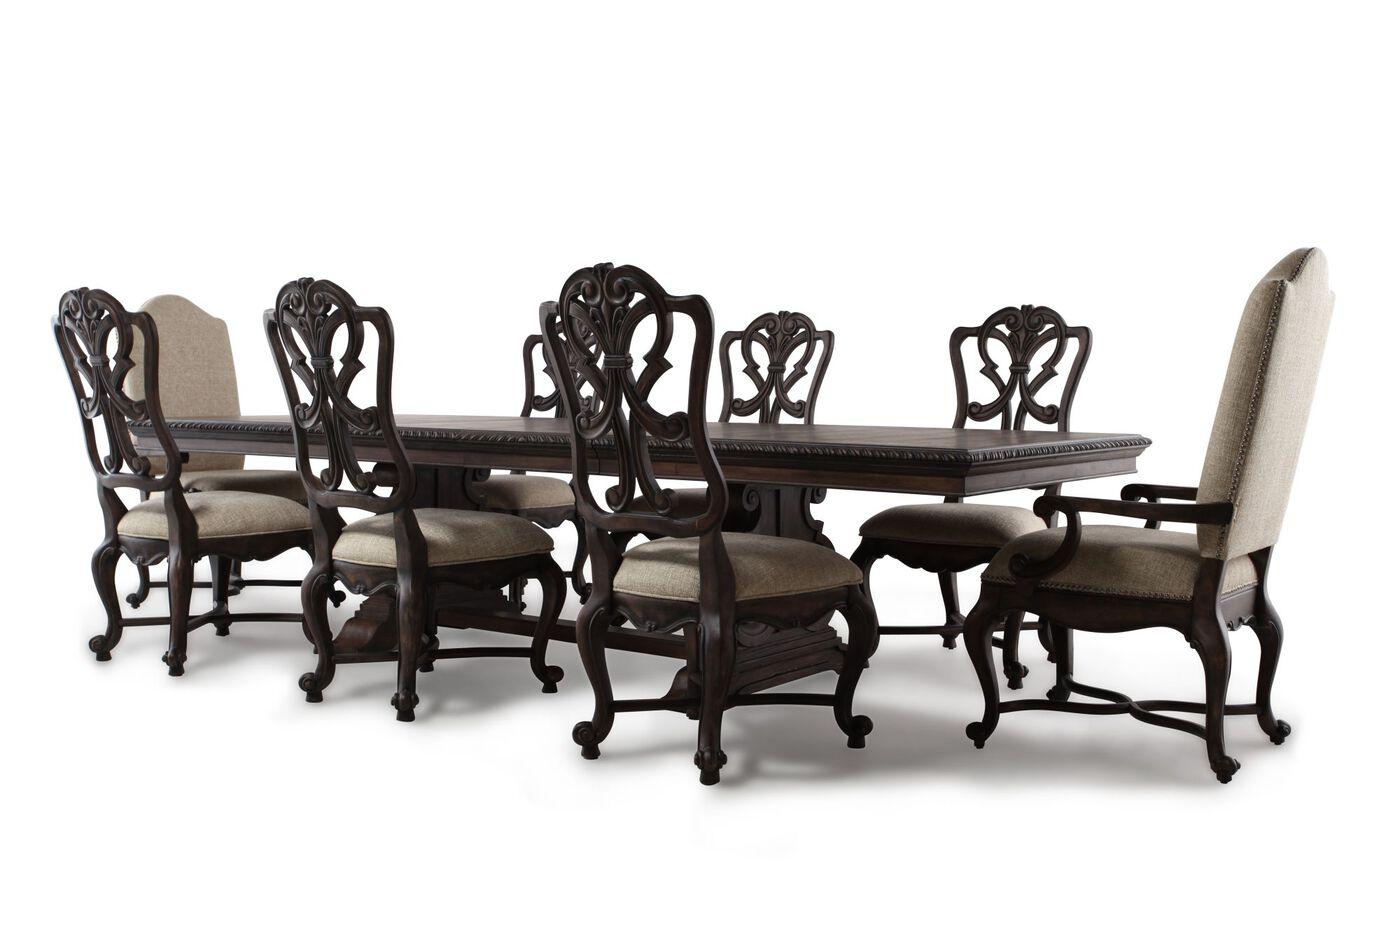 hooker rhapsody nine piece dining set mathis brothers furniture hooker rhapsody nine piece dining set